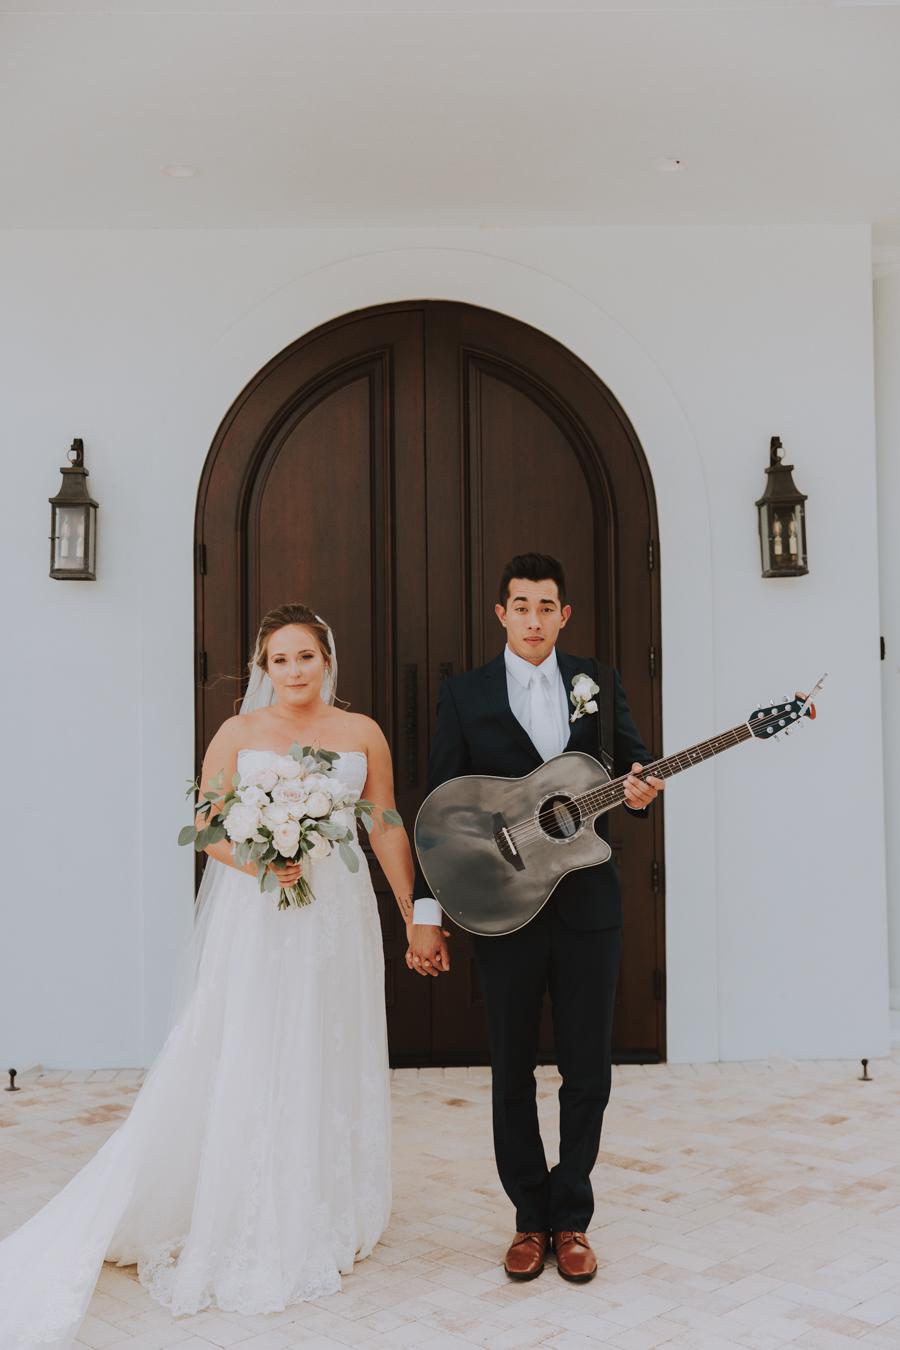 Harborside Chapel Wedding Clearwater Affordable Tampa Venues BHLDN Palm Harbor Safety Harbor Resort and Spa Wedding Malindy Elene Bridal St Pete Wedding Photographer Tampa Wedding Photographer-74.jpg